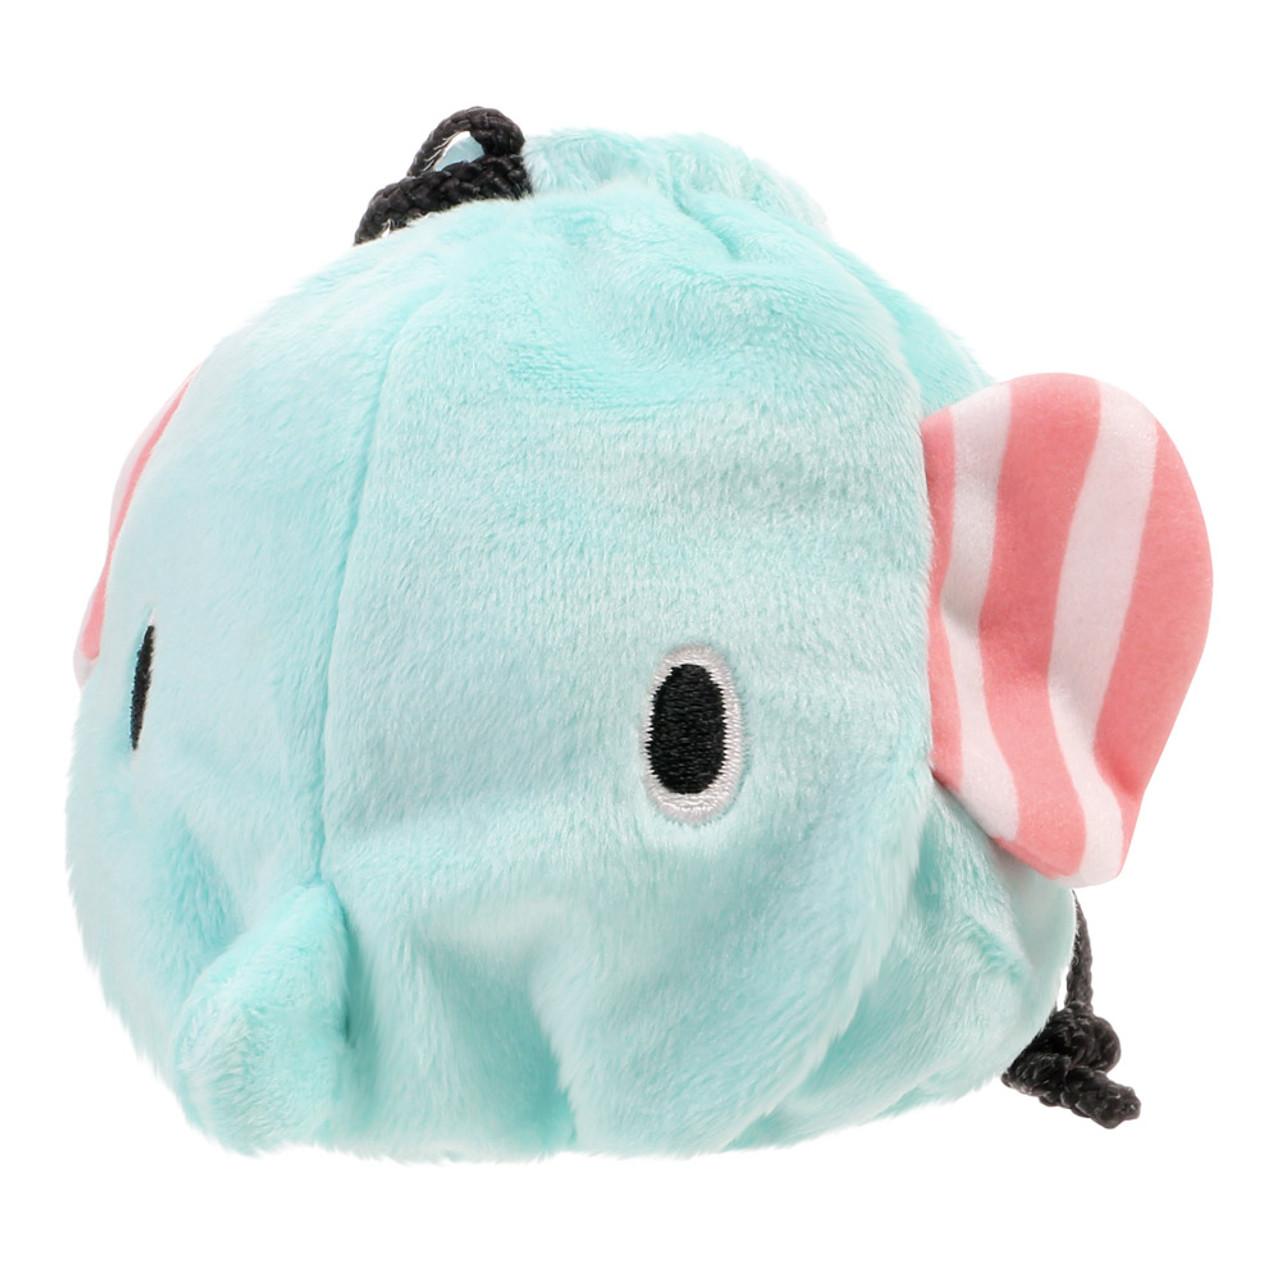 Sentimental Circus Mouton Elephant Face Plush Drawstring Bag ( Front View )